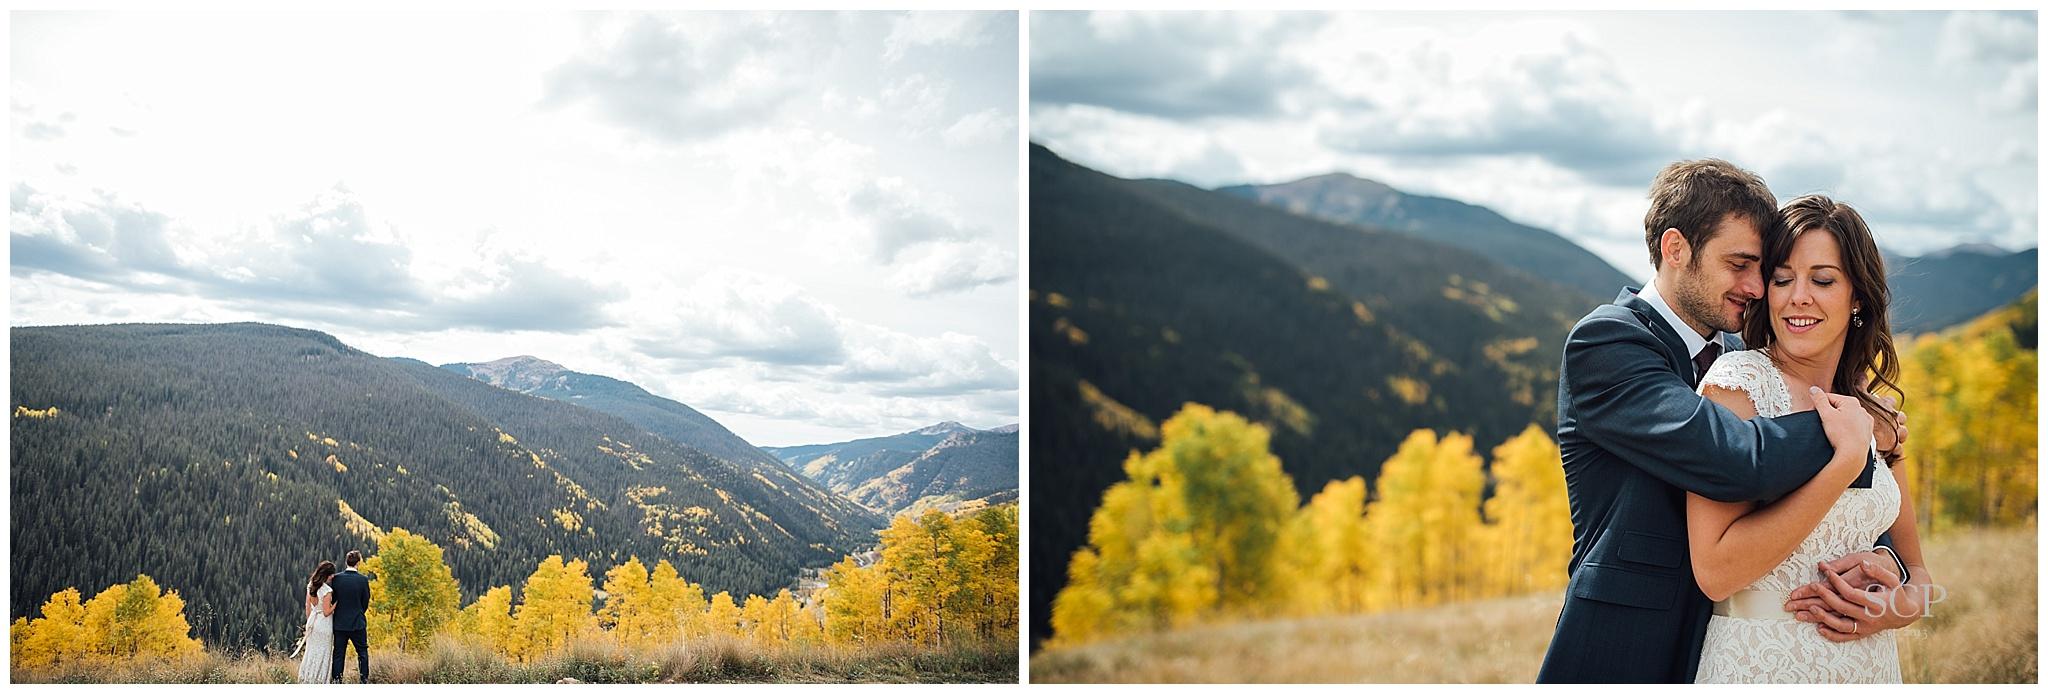 Dunton Hot Springs, Colorado, Elopement, Elopement photographer, destination wedding photographer